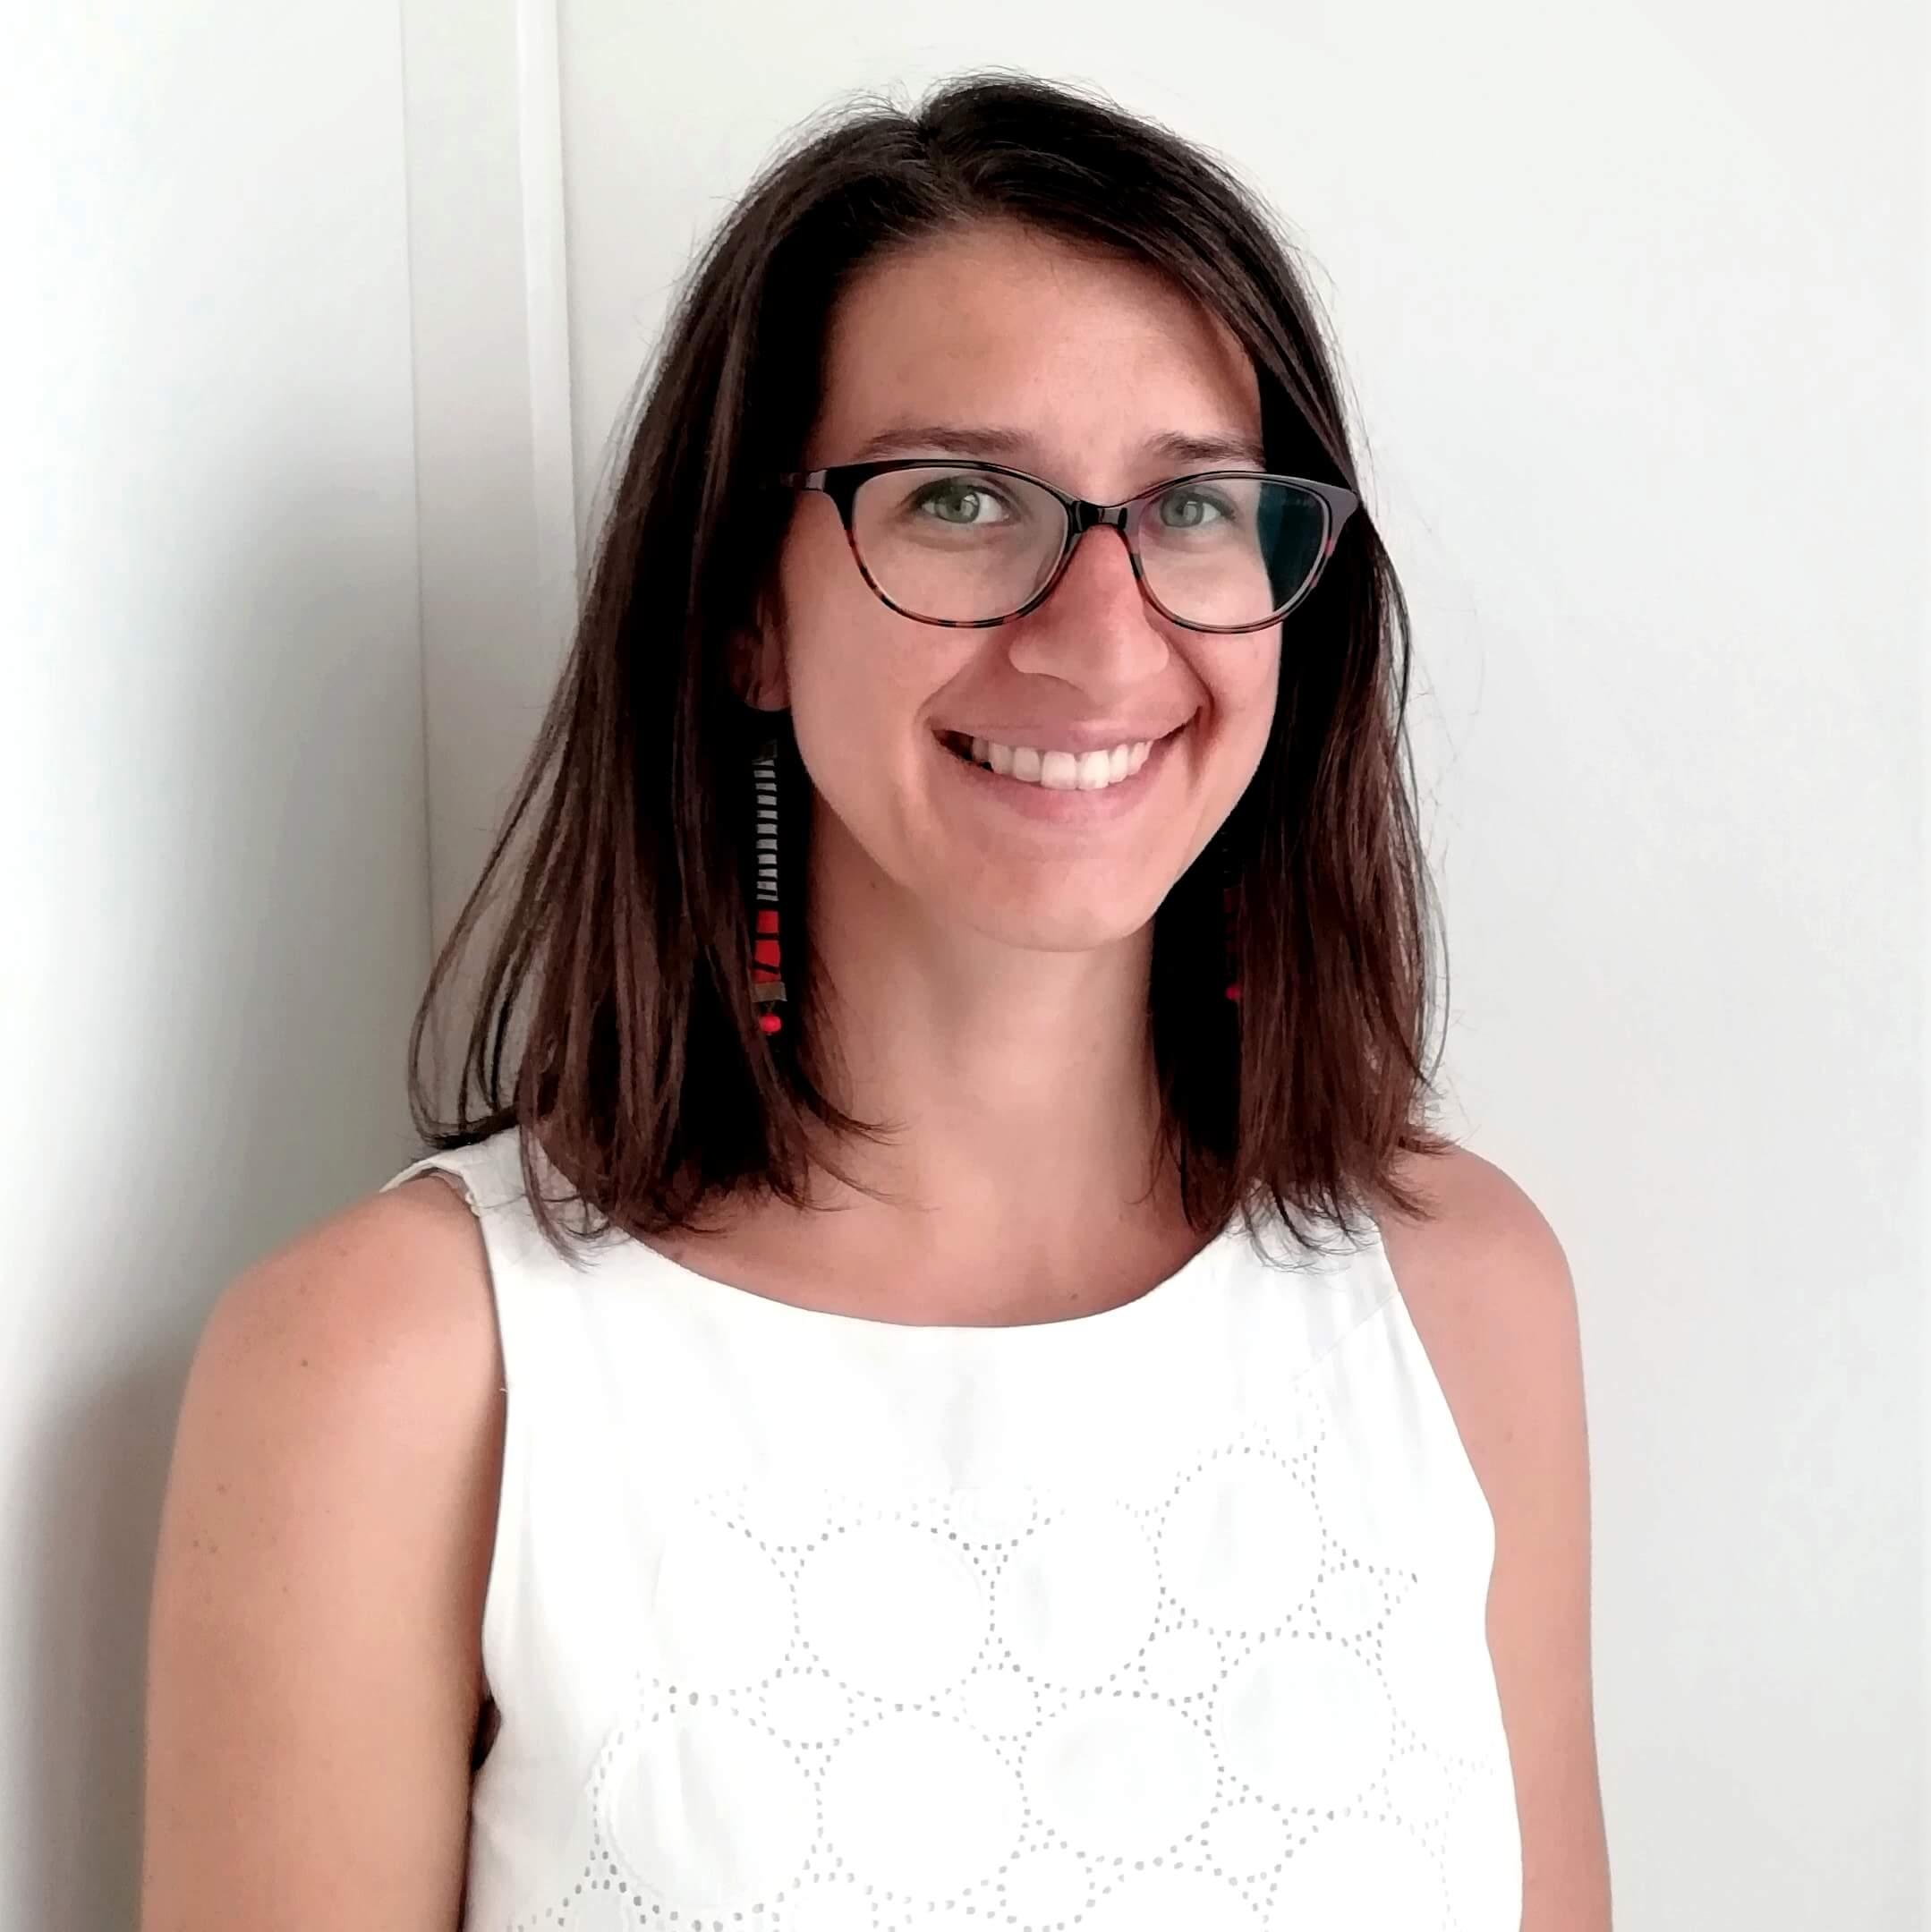 Mélanie Jacquemond